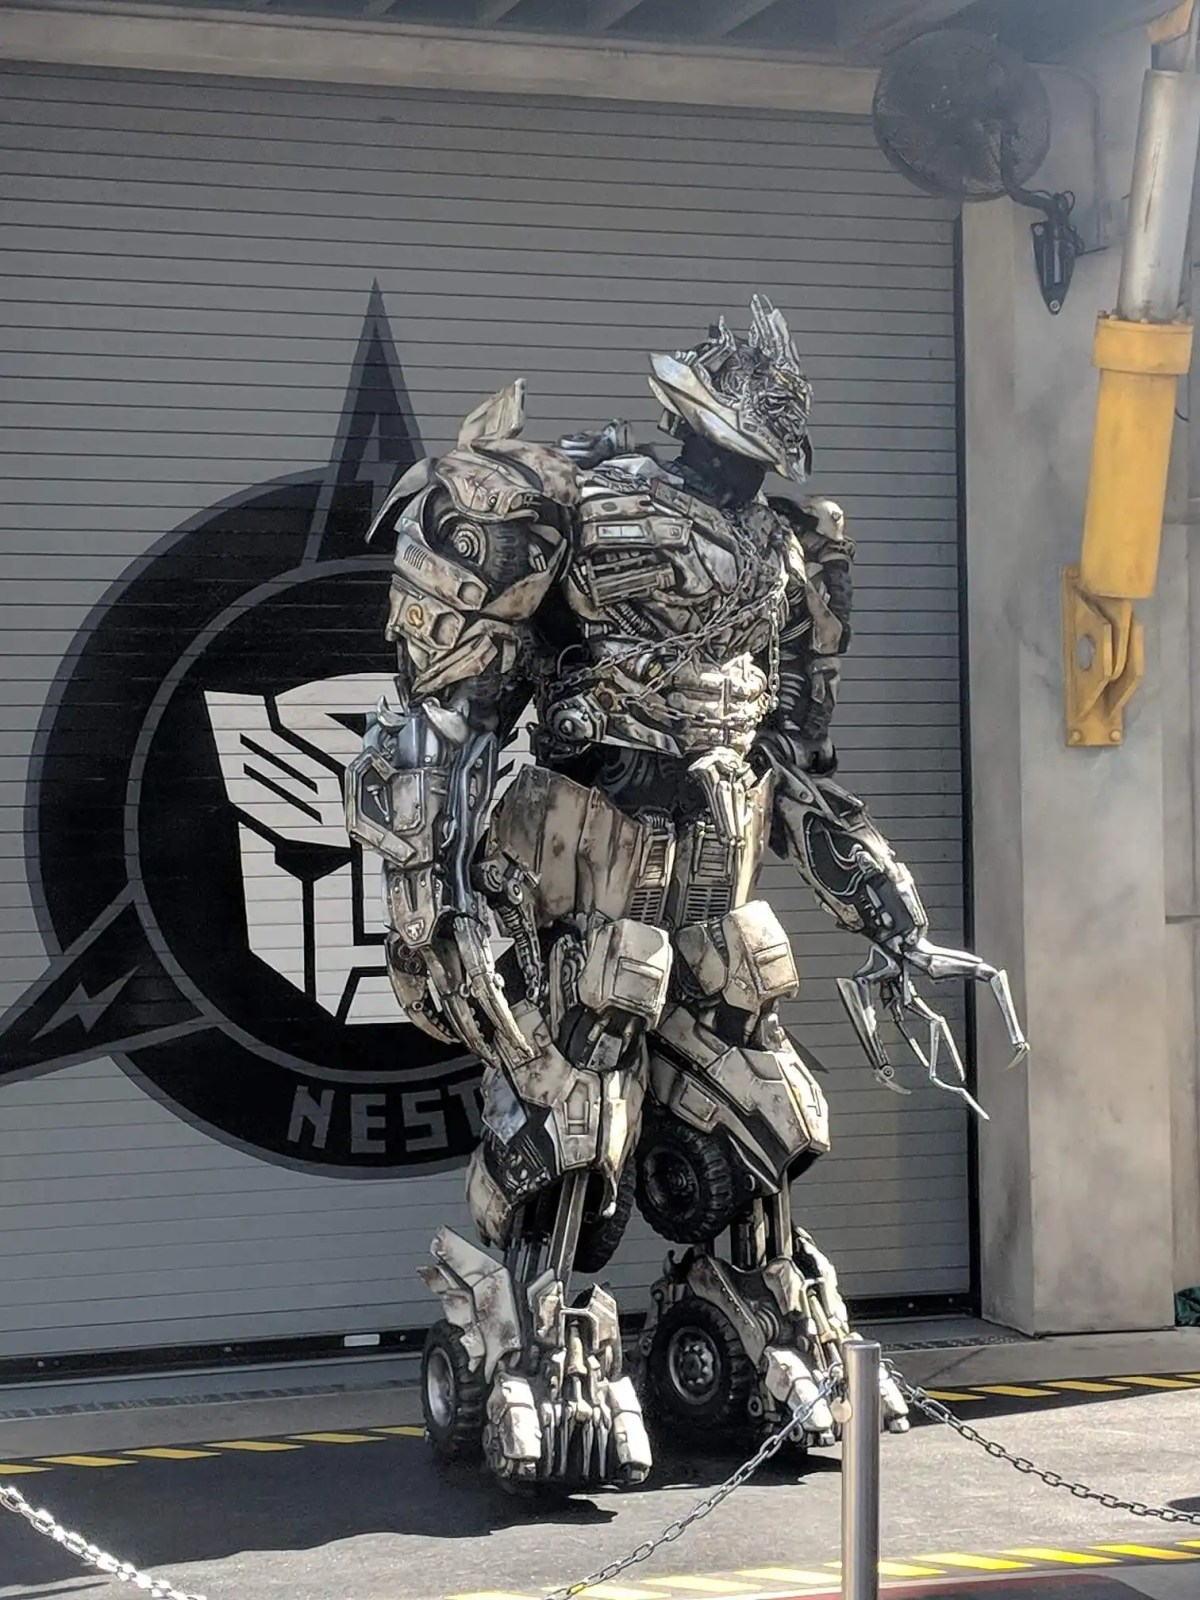 Decepticon at the Transformers exhibit